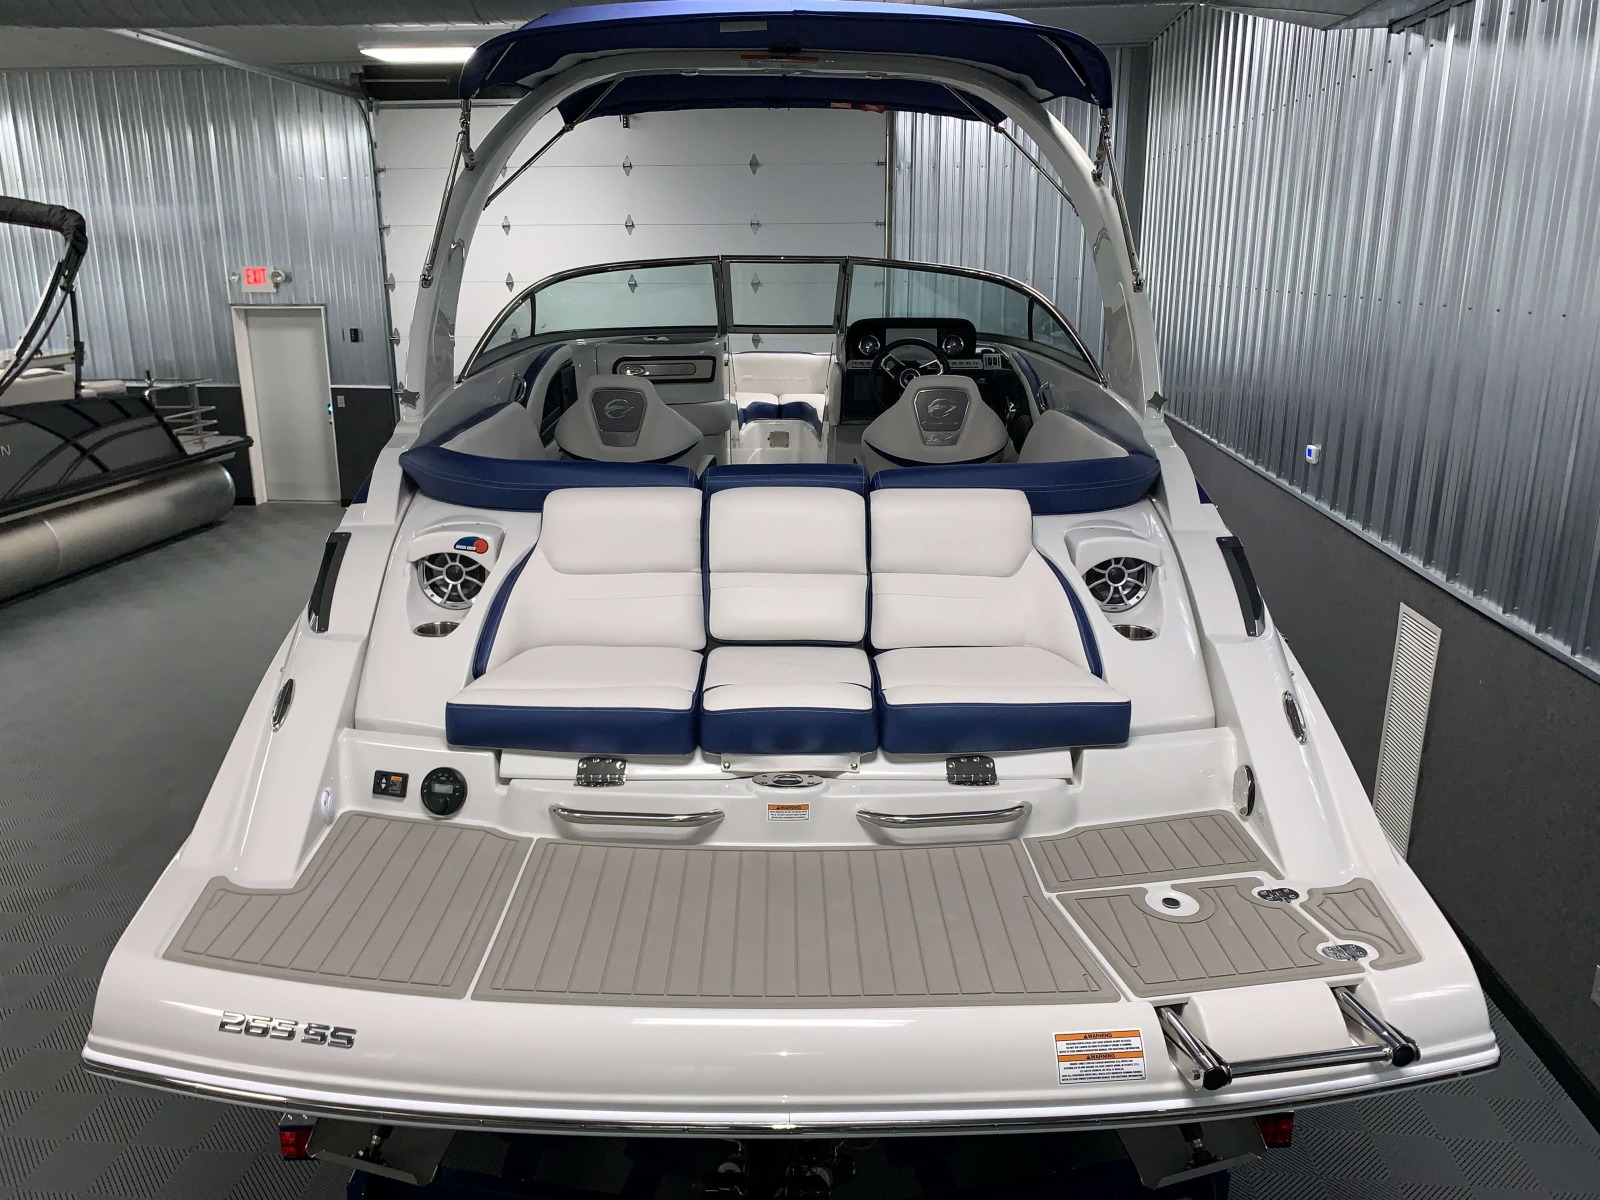 Rear Facing Seats of the 2021 Crownline 265 SS Bowrider Boat